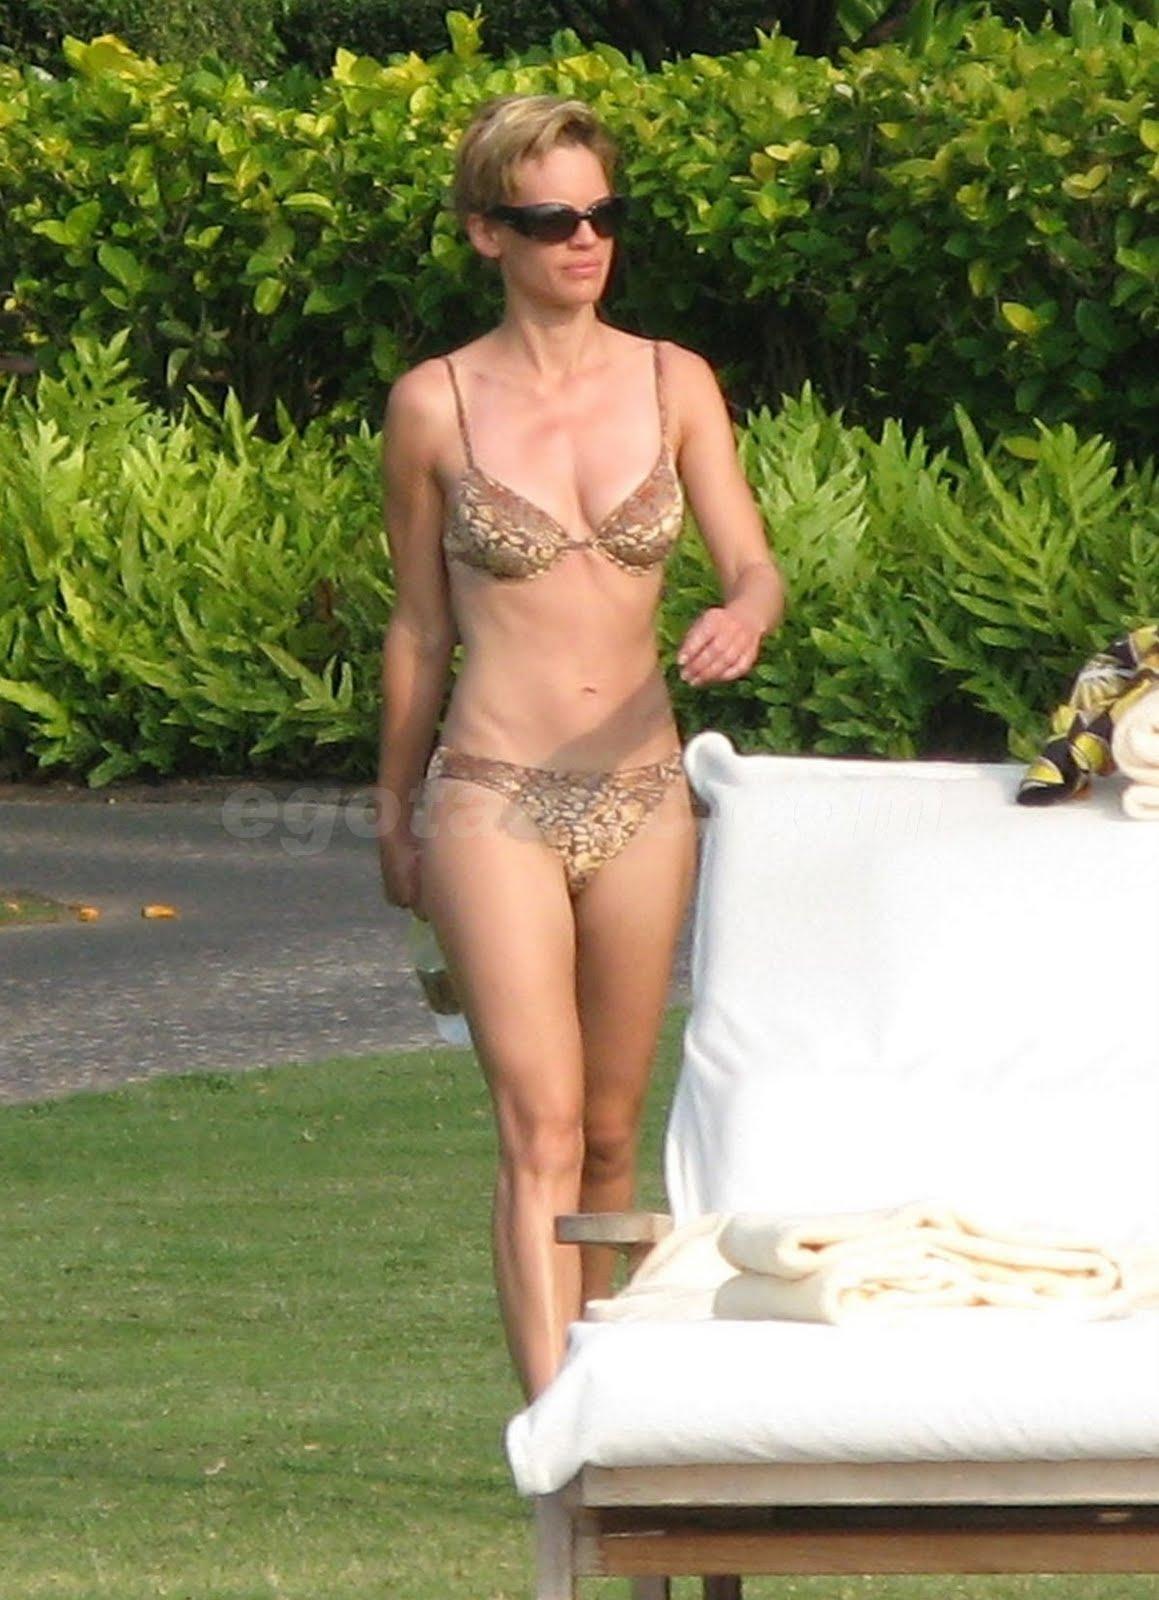 http://4.bp.blogspot.com/_3G4dg-GWVKI/TJNOYBc6juI/AAAAAAAAIAw/T6PkgkMuM8E/s1600/11155_hilary-swank-bikini-1-07_123_479lo.jpg